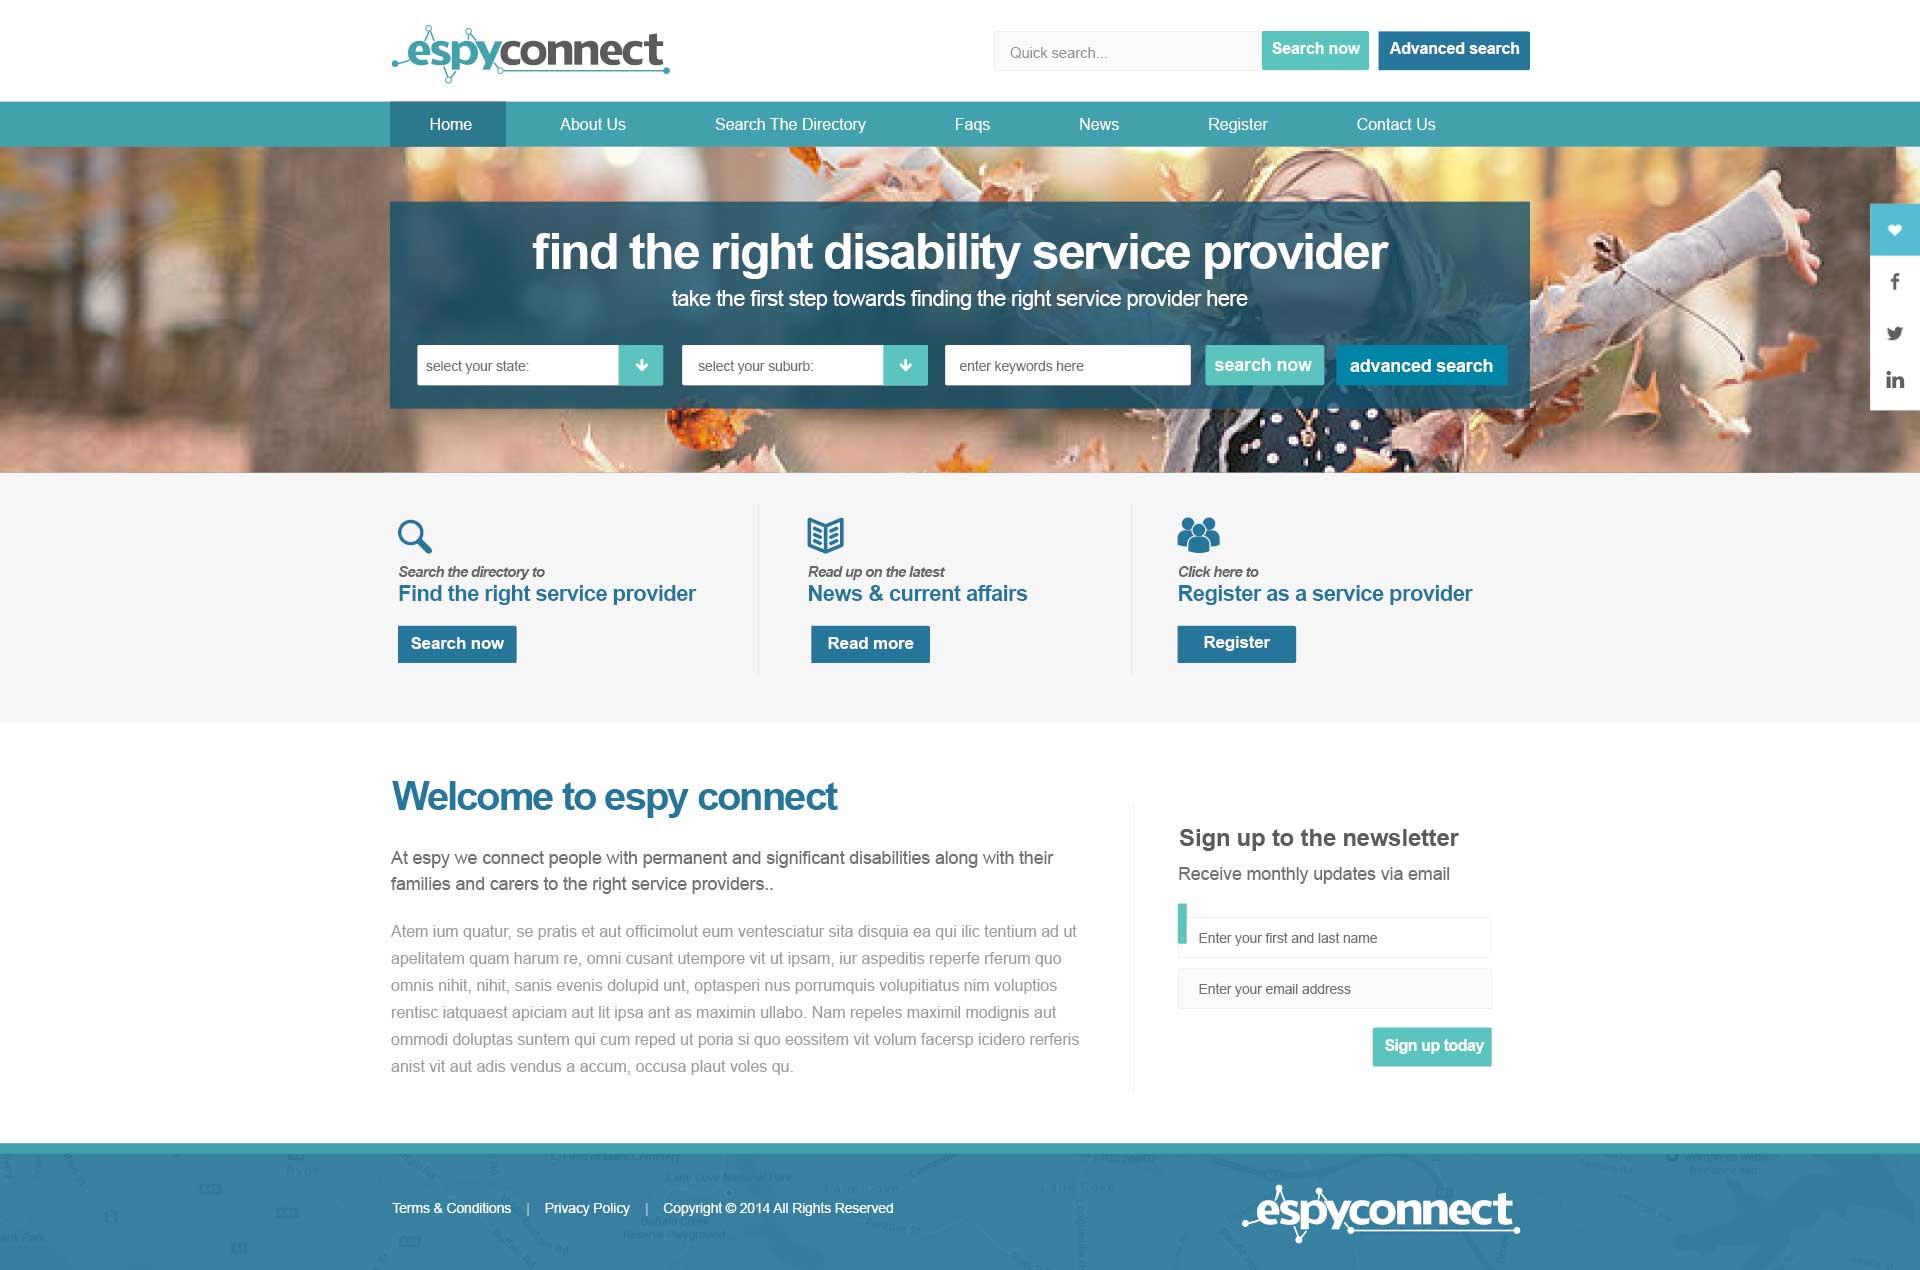 ESPY Connect